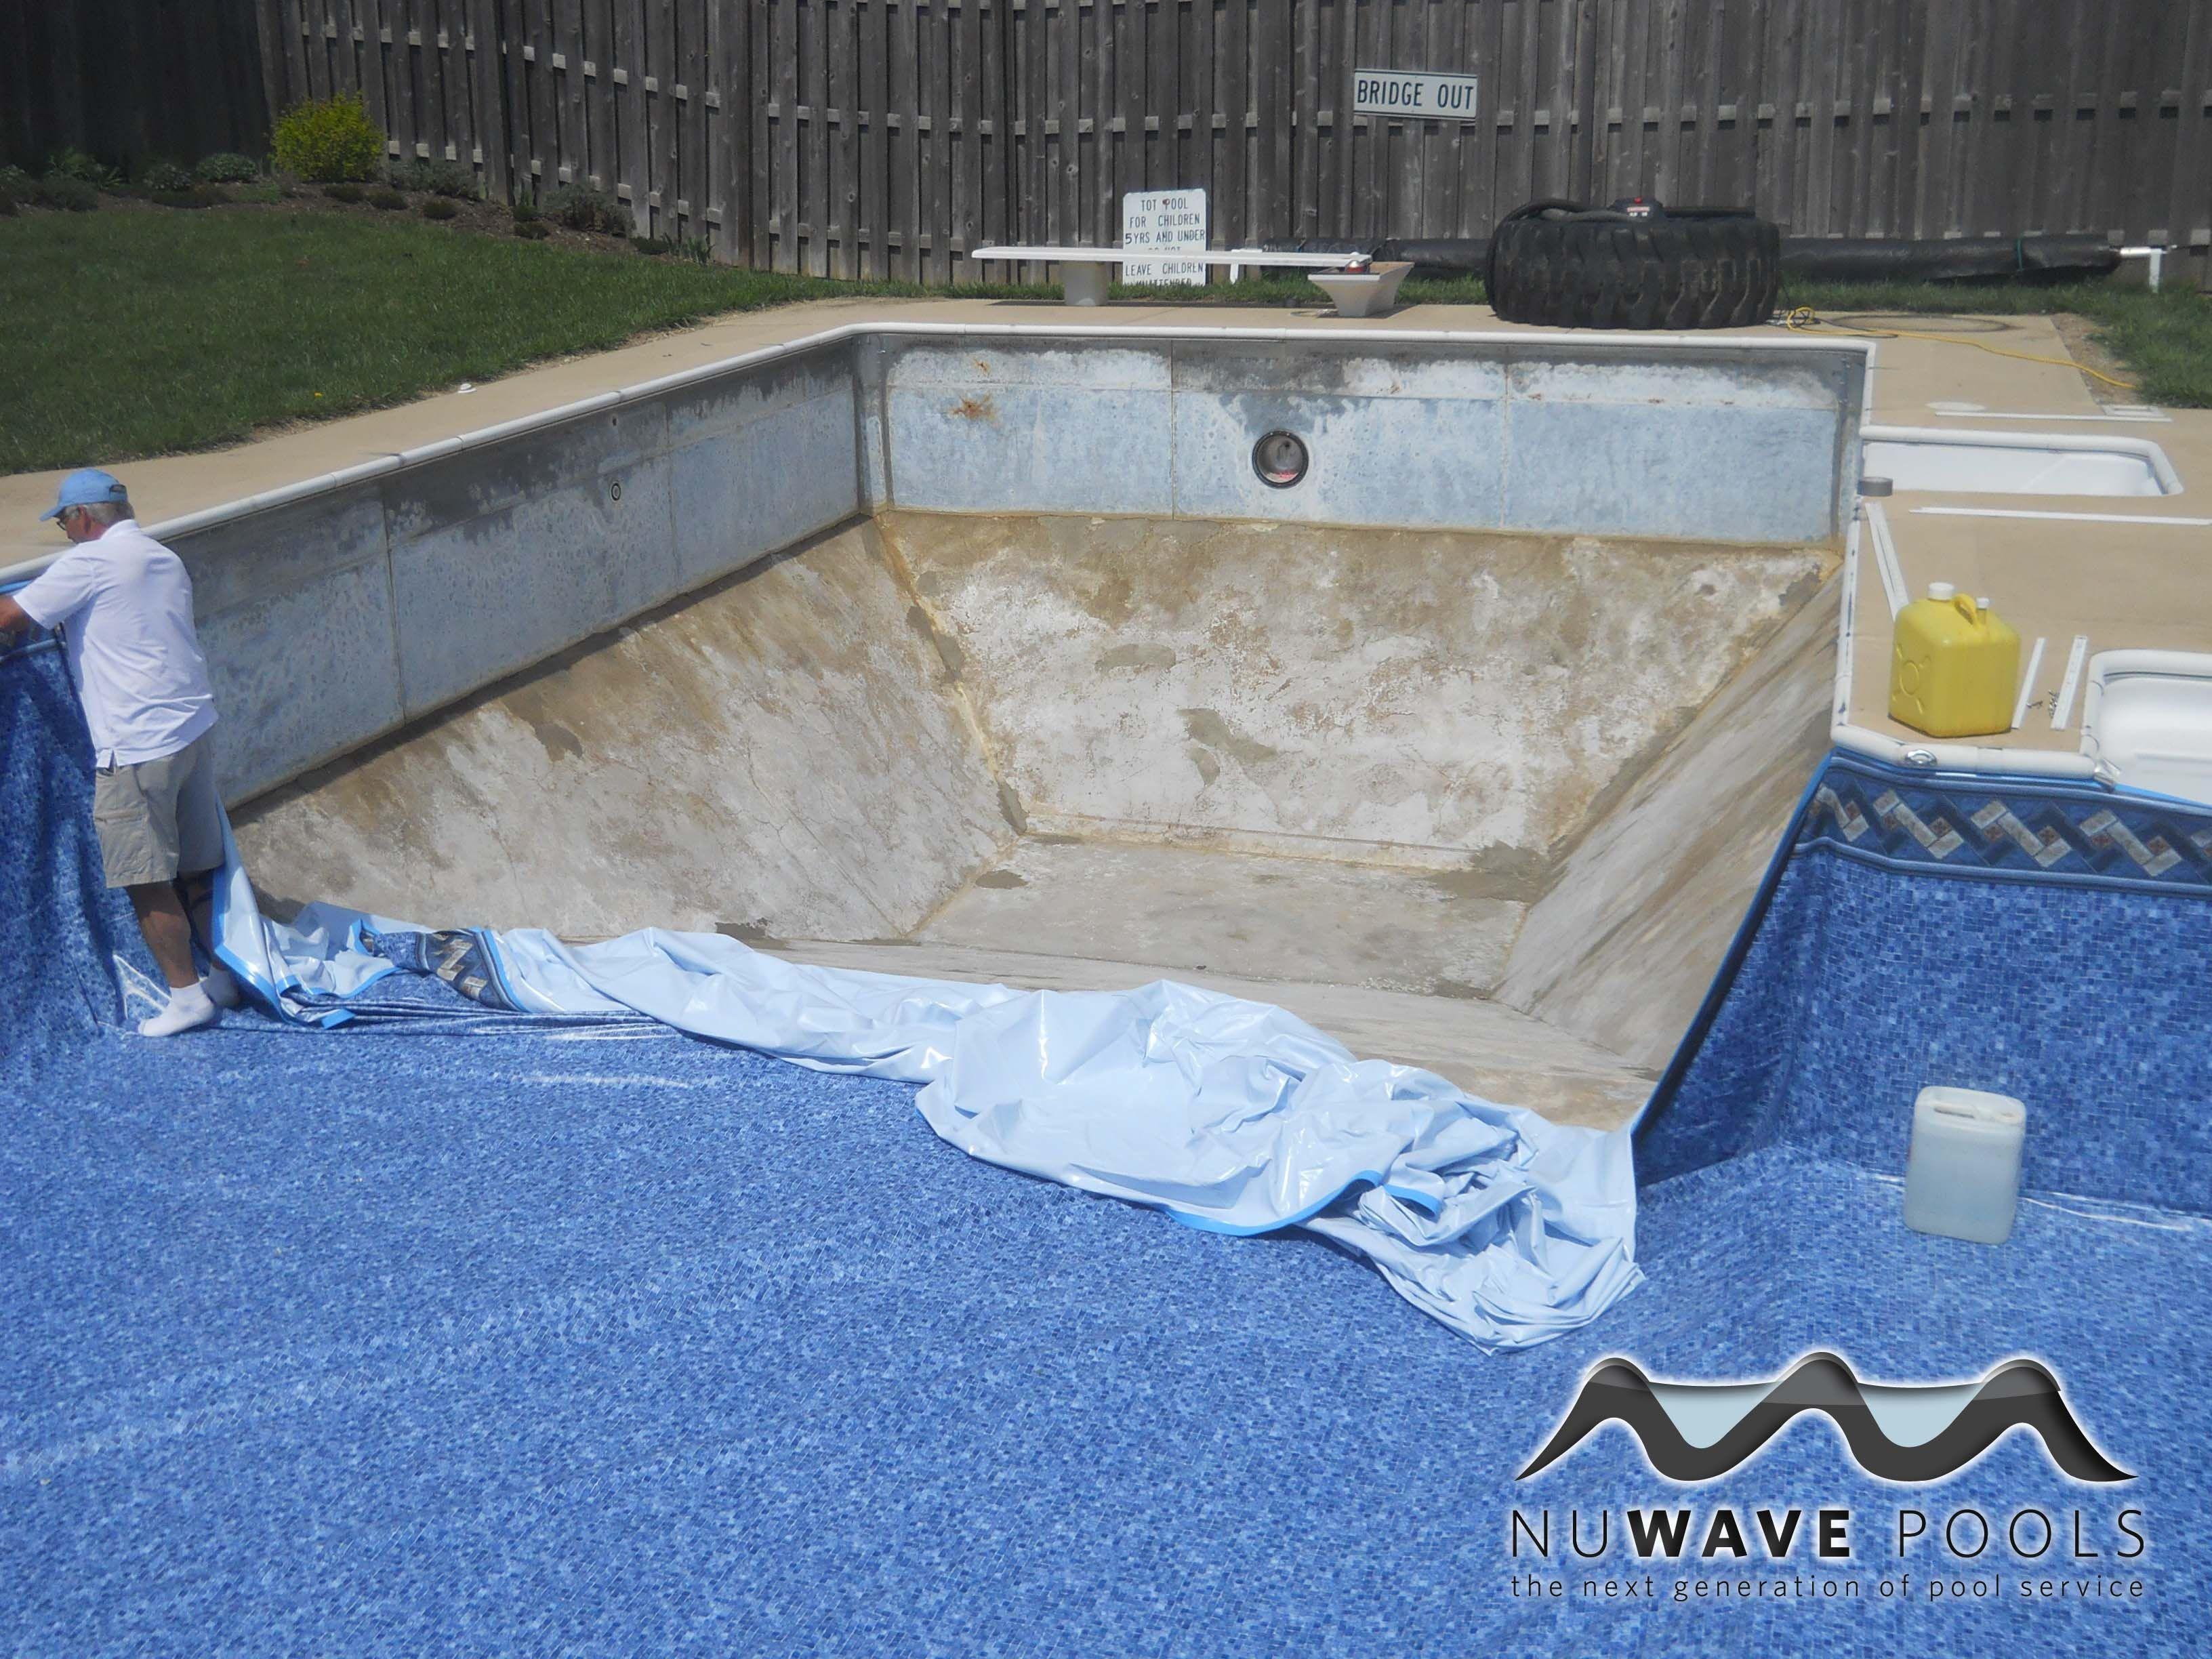 66fd3295ecb66b2b8e28f3d625249116 - How To Get Glass Out Of A Vinyl Pool